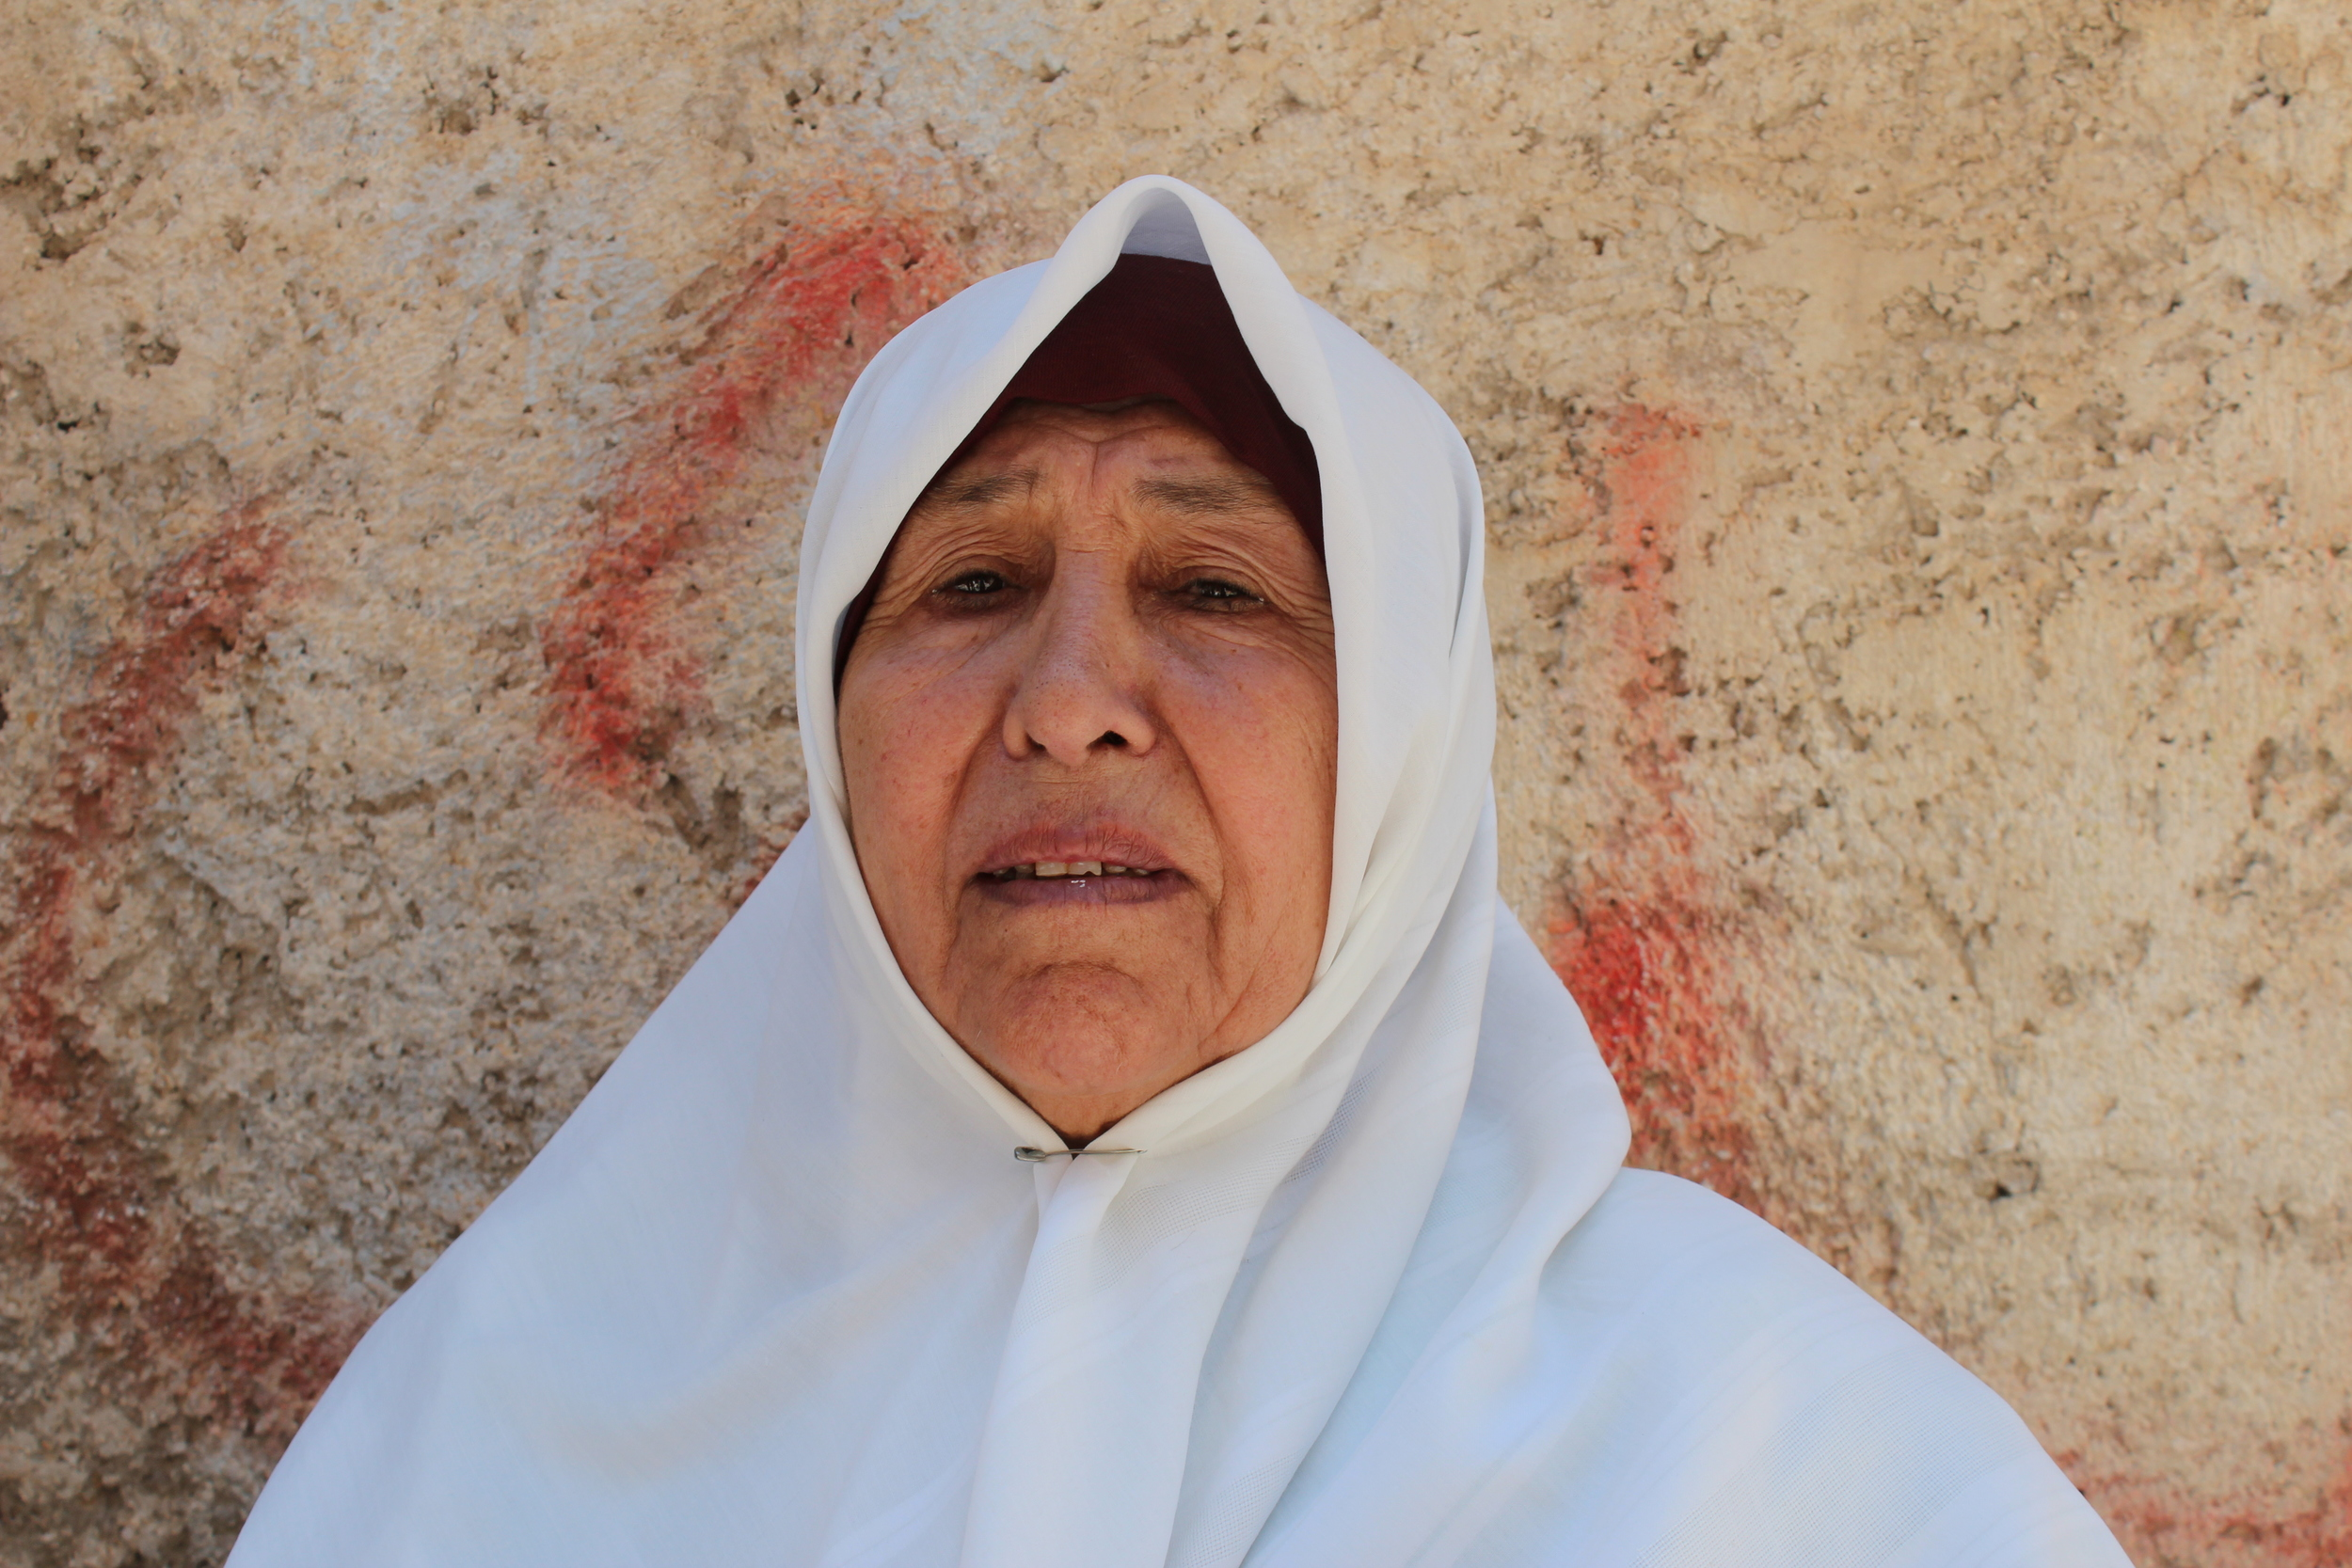 Palestinian refugee Nehady Yousif. Photograph by Edwina Toohey